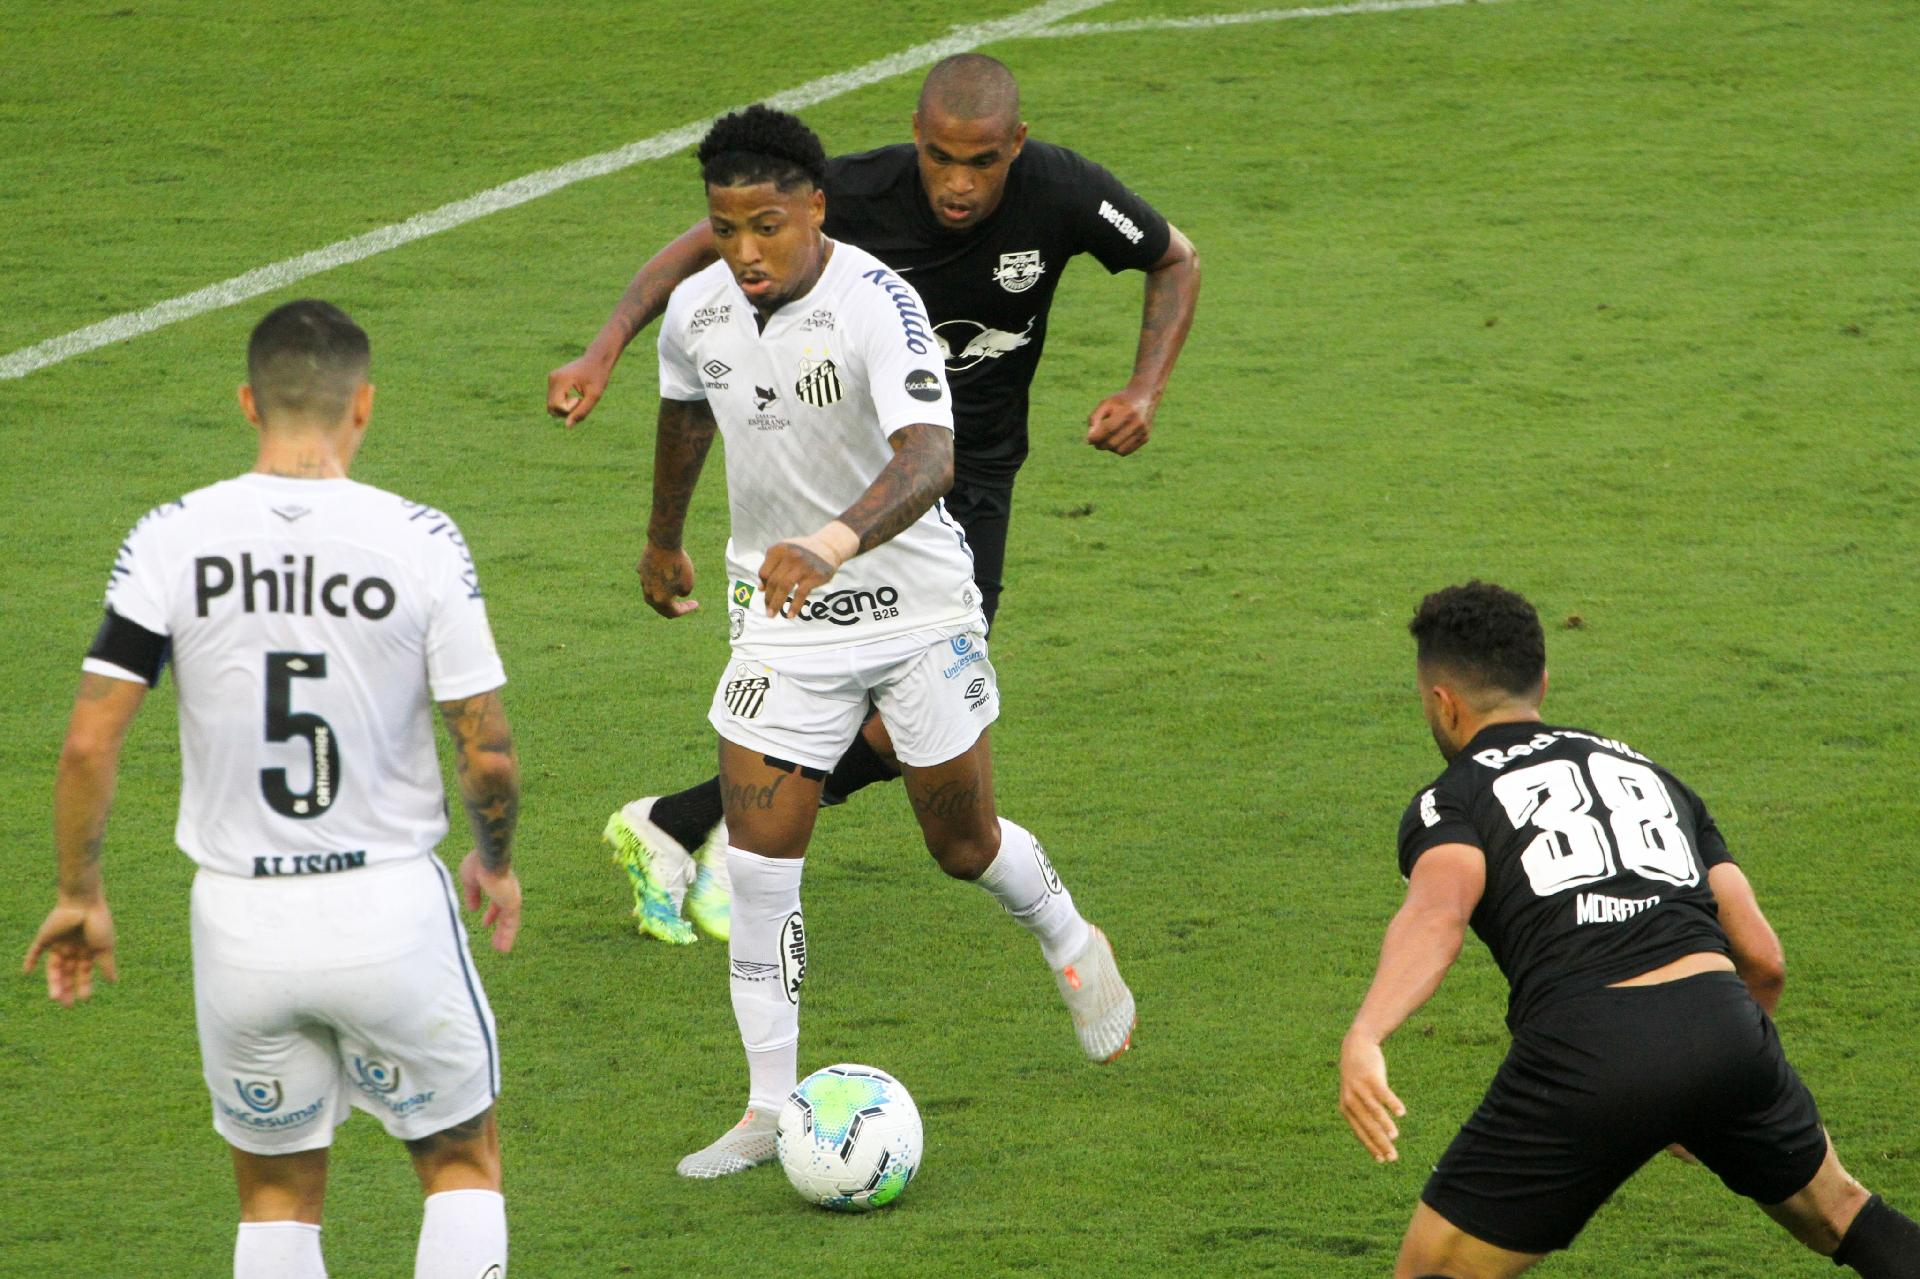 Red Bull Bragantino vs Santos